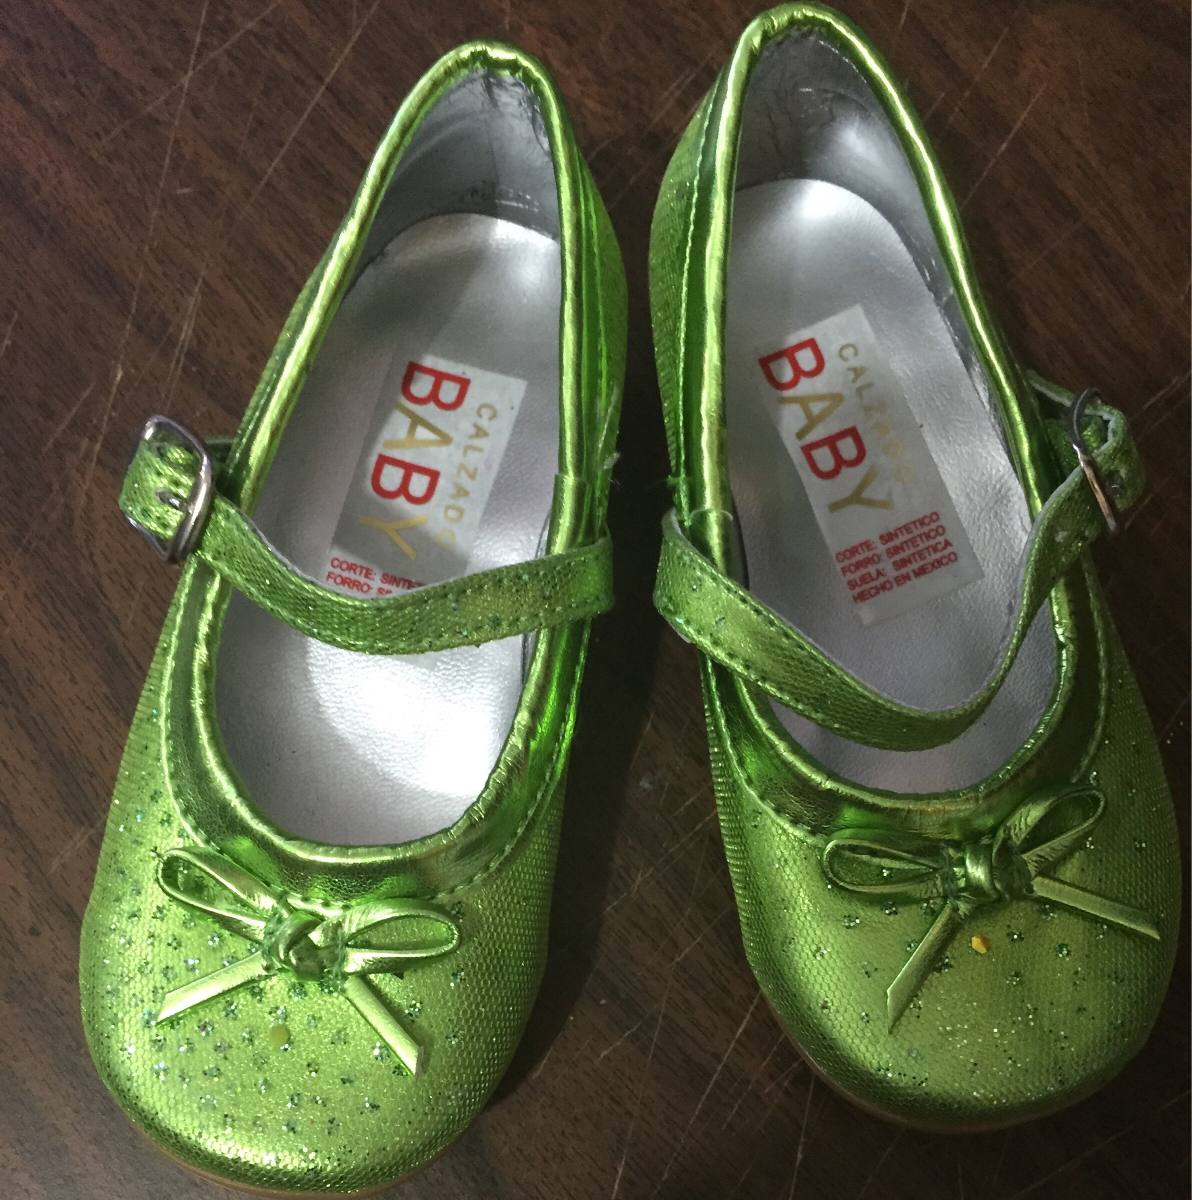 Blanca Coronas380 Anna Nieves Princesas Minnie Zapatos 00 Elsa 80OvwmNn